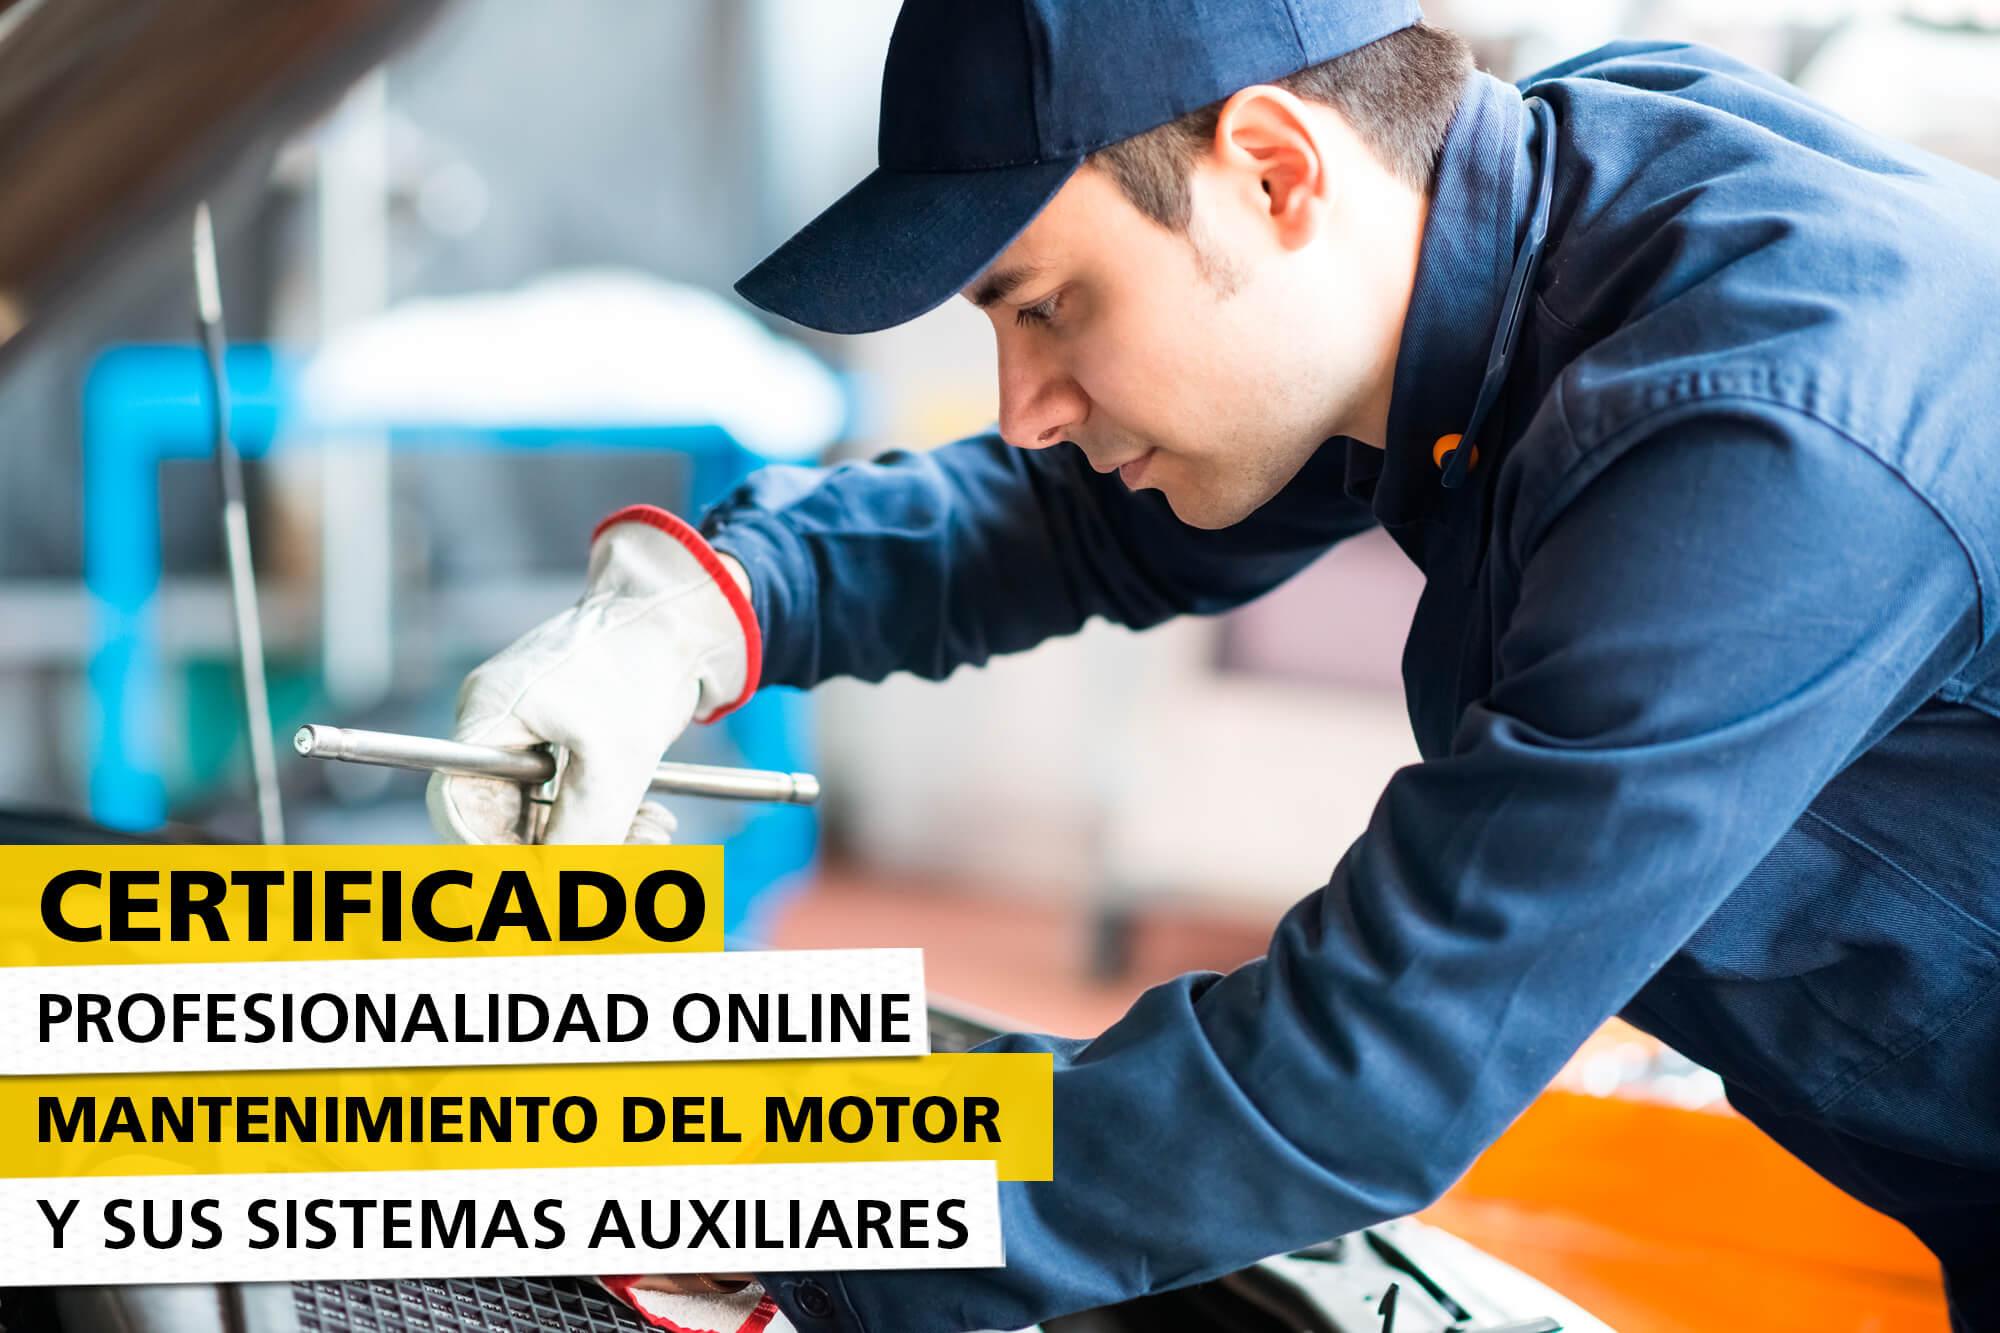 CPO-mantenimiento-motor-sistemas-auxiliares-img-destacadaº